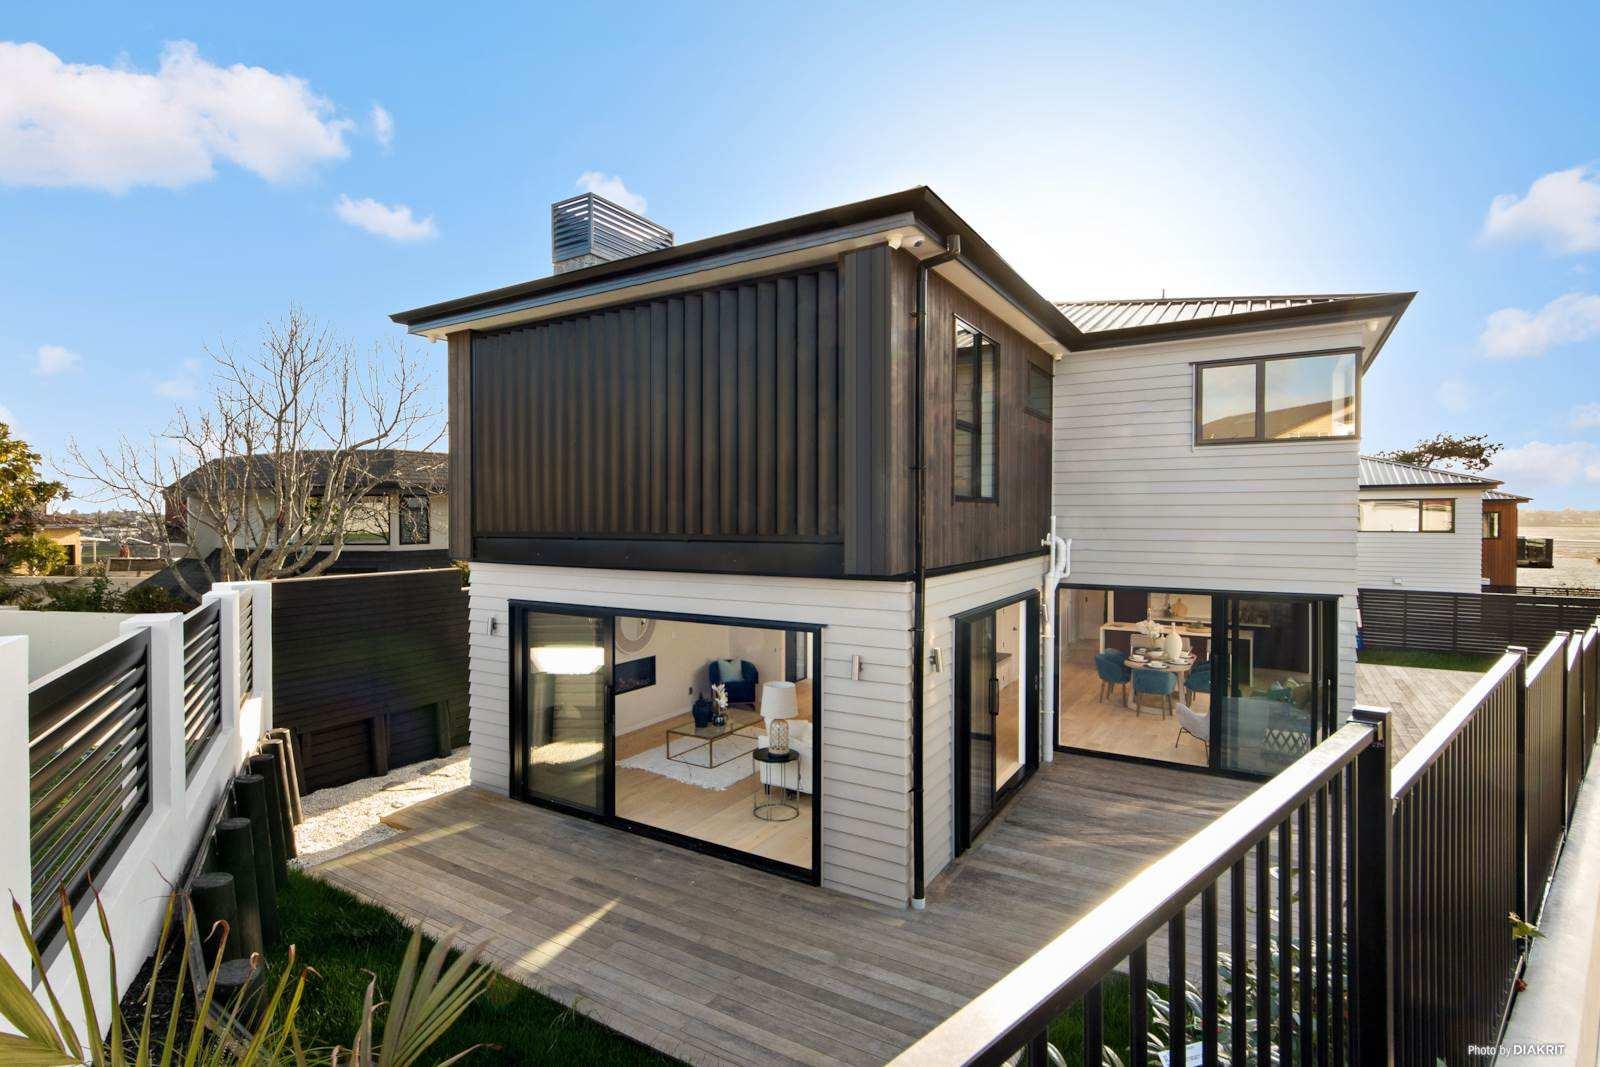 Half Moon Bay 5房 Macleans学区全新雅墅 享半月湾旖旎风光 装潢高档 配套醇熟 静候幸运买家! Sophisticated Elegant New Build in Macleans Zone